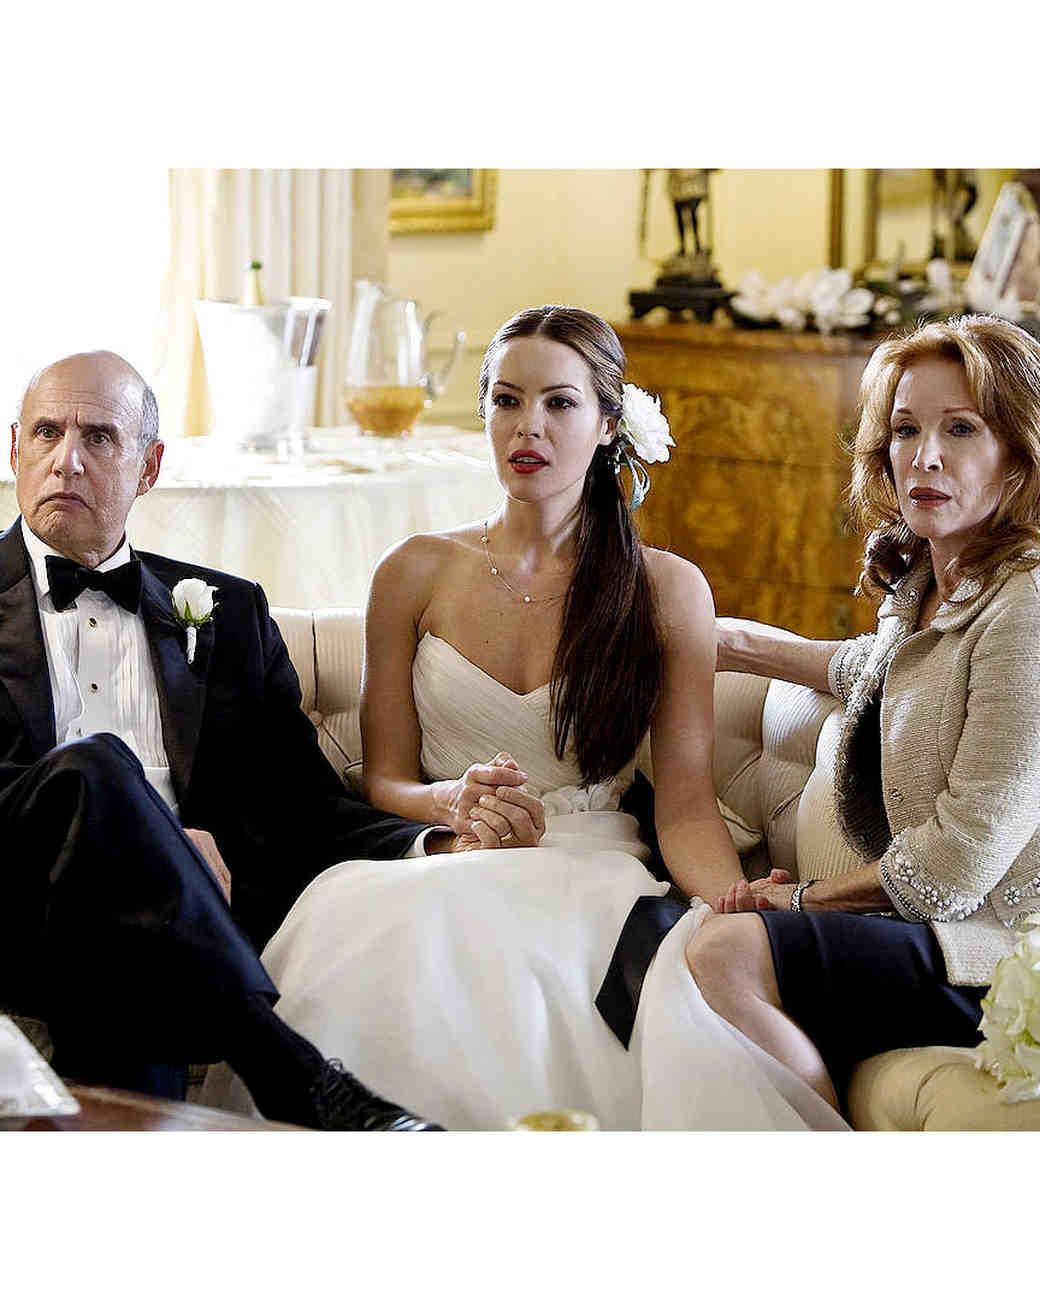 movie-wedding-dresses-the-hangover-sasha-barrese-0316.jpg